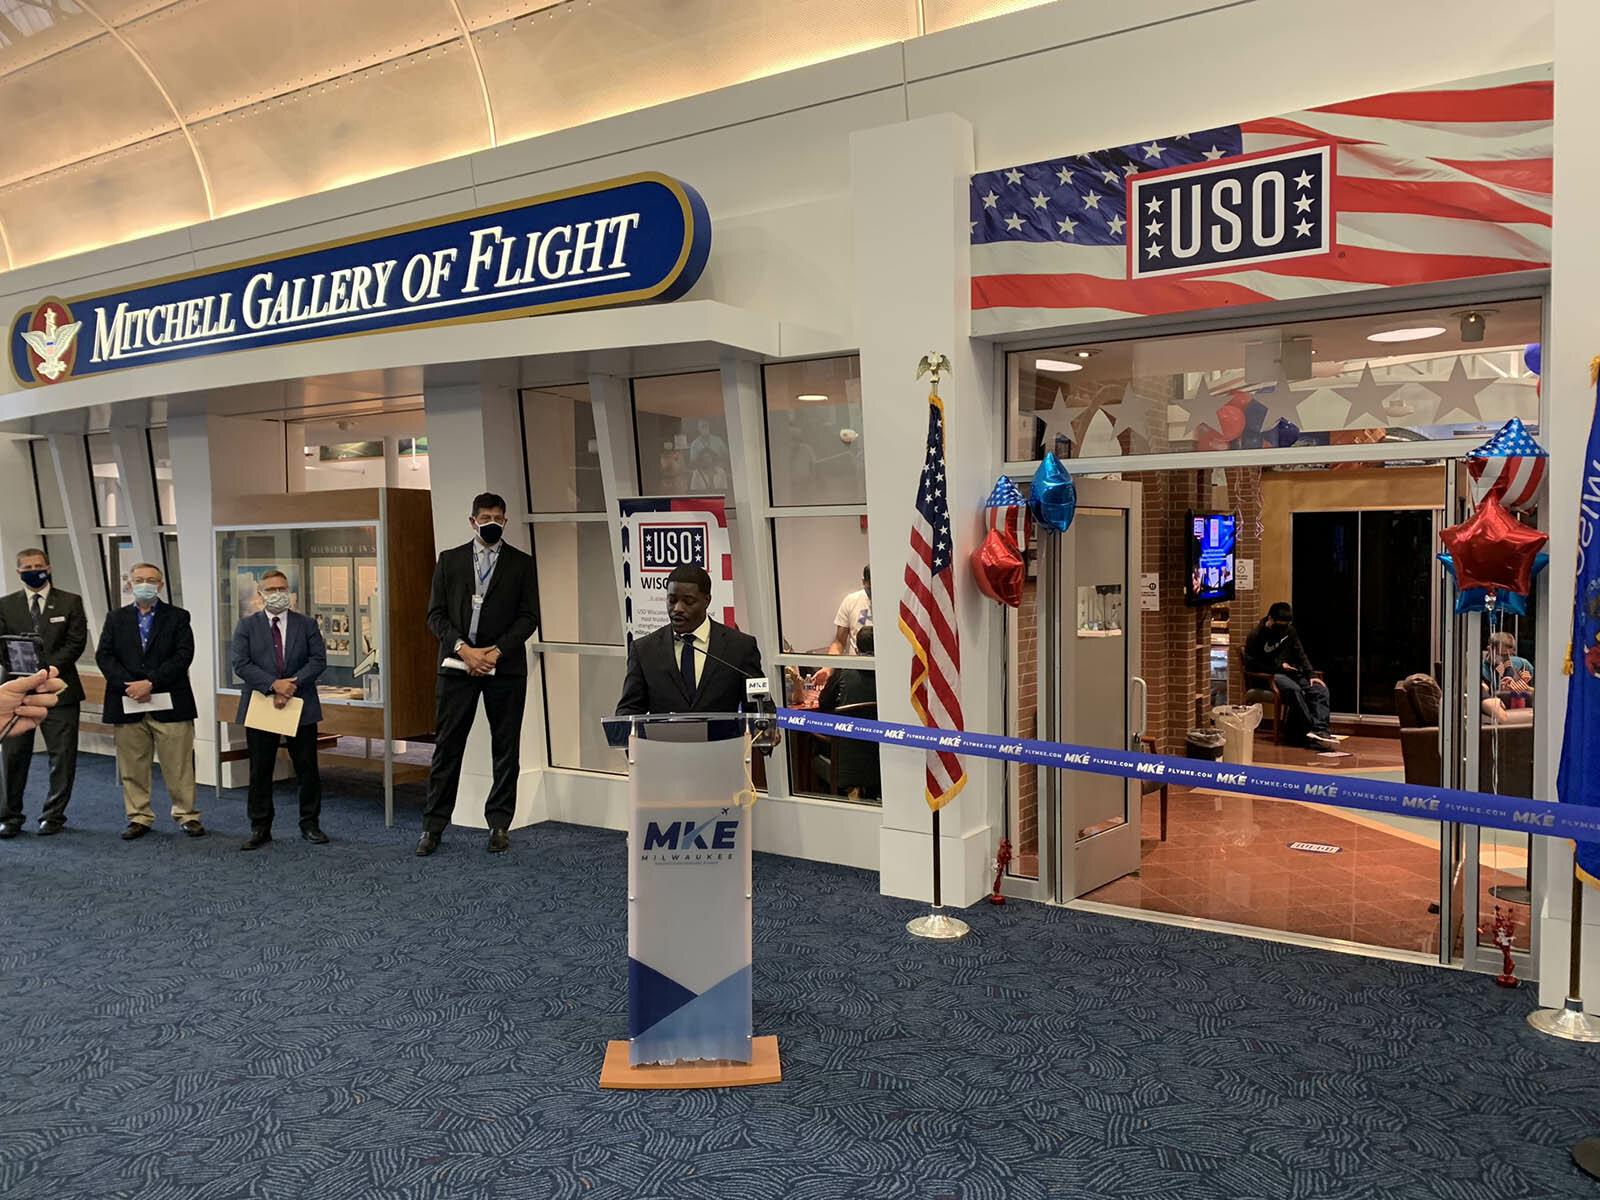 mitchell gallery of flight uso fullsize story1.